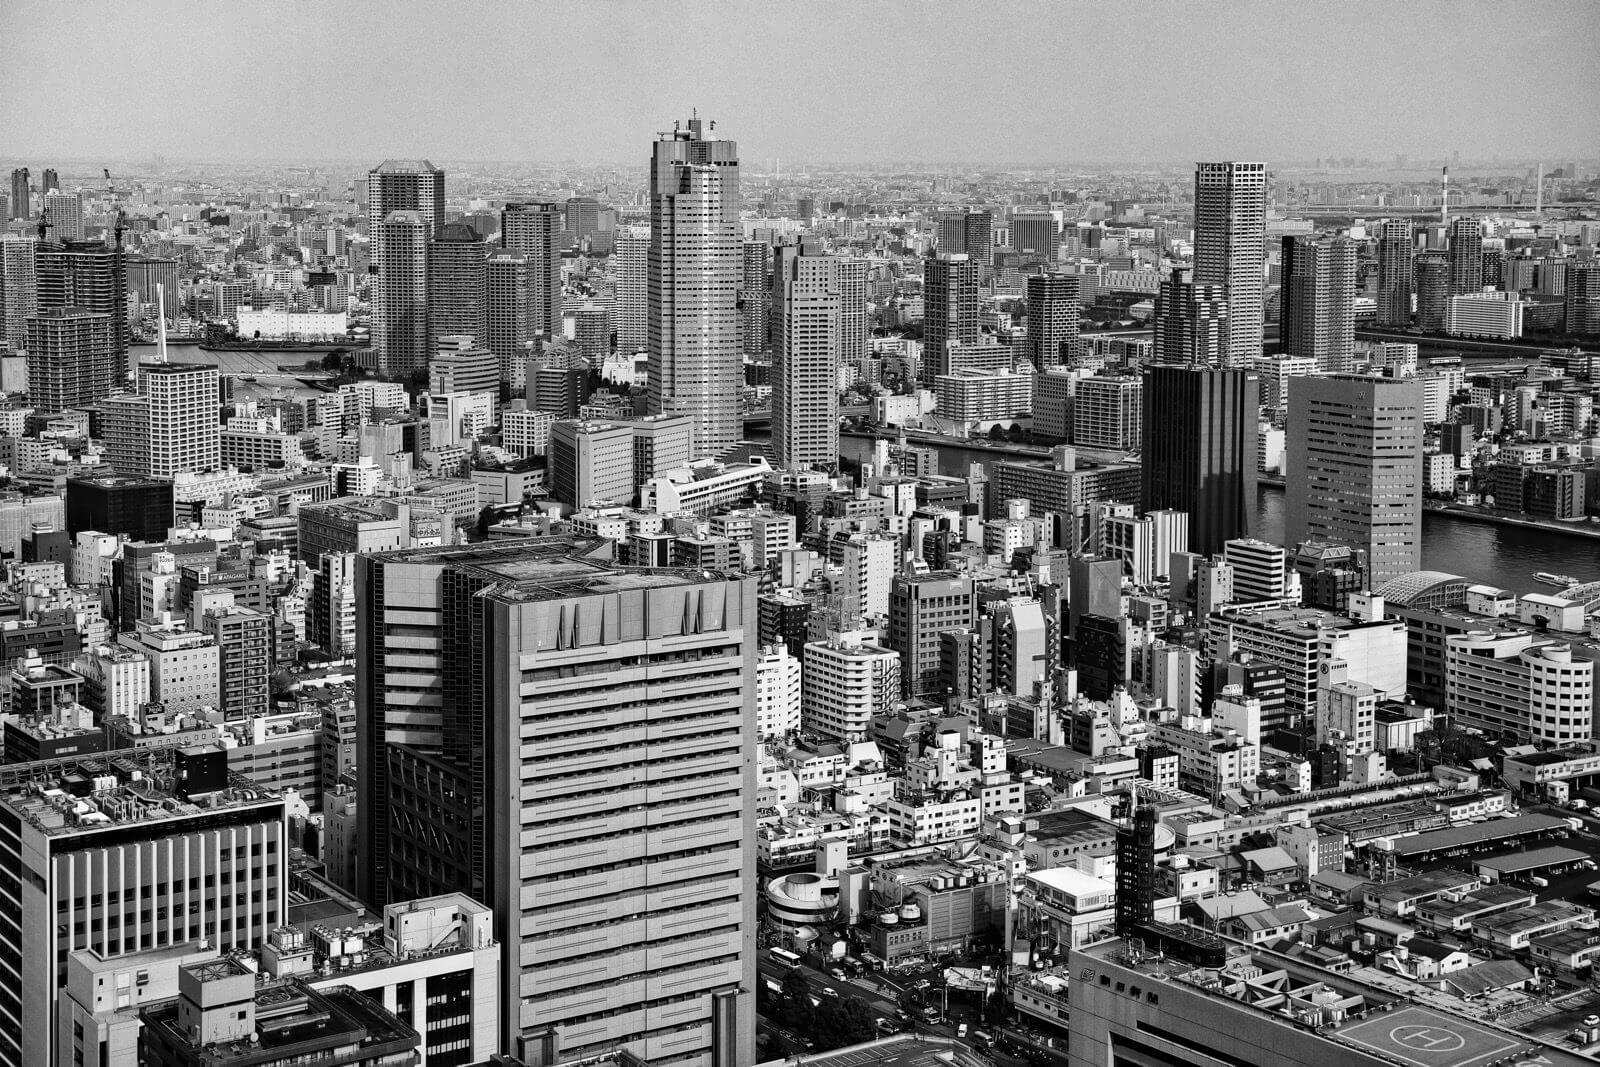 Tokyo skyline - Photo by Zdenek Sindelar of CuriousZed Photography